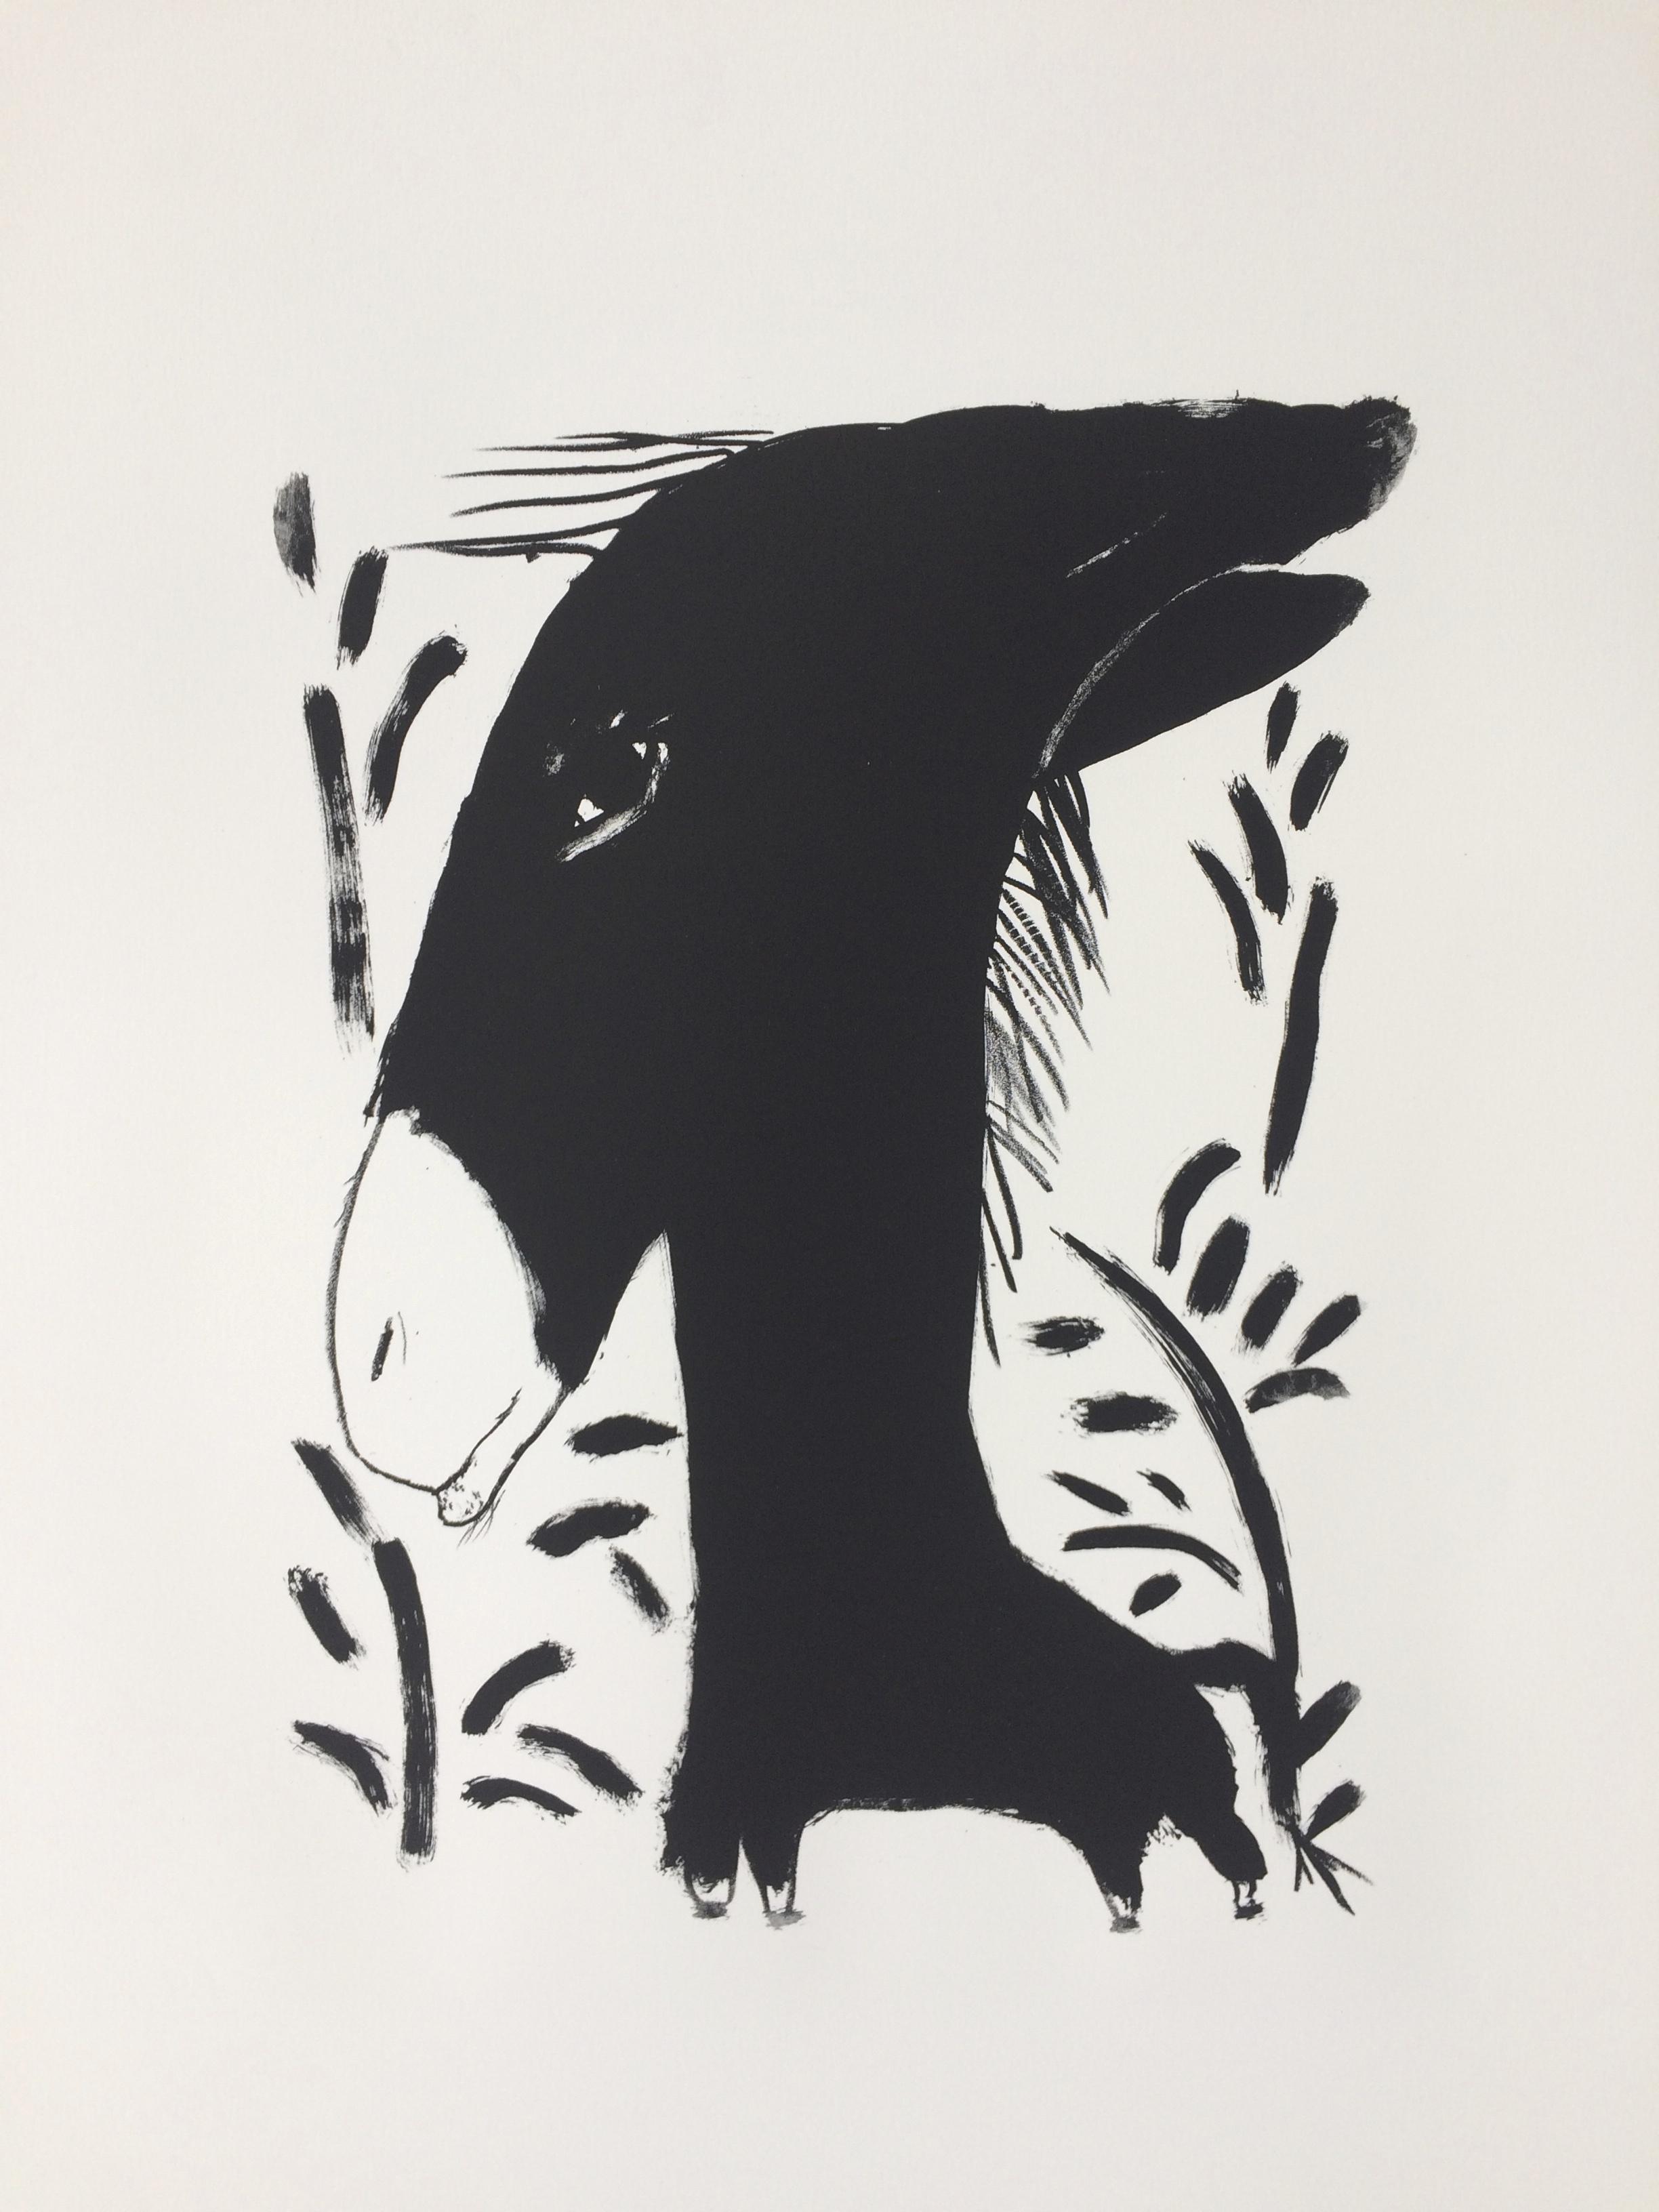 L'âne, 56 x 76 cm